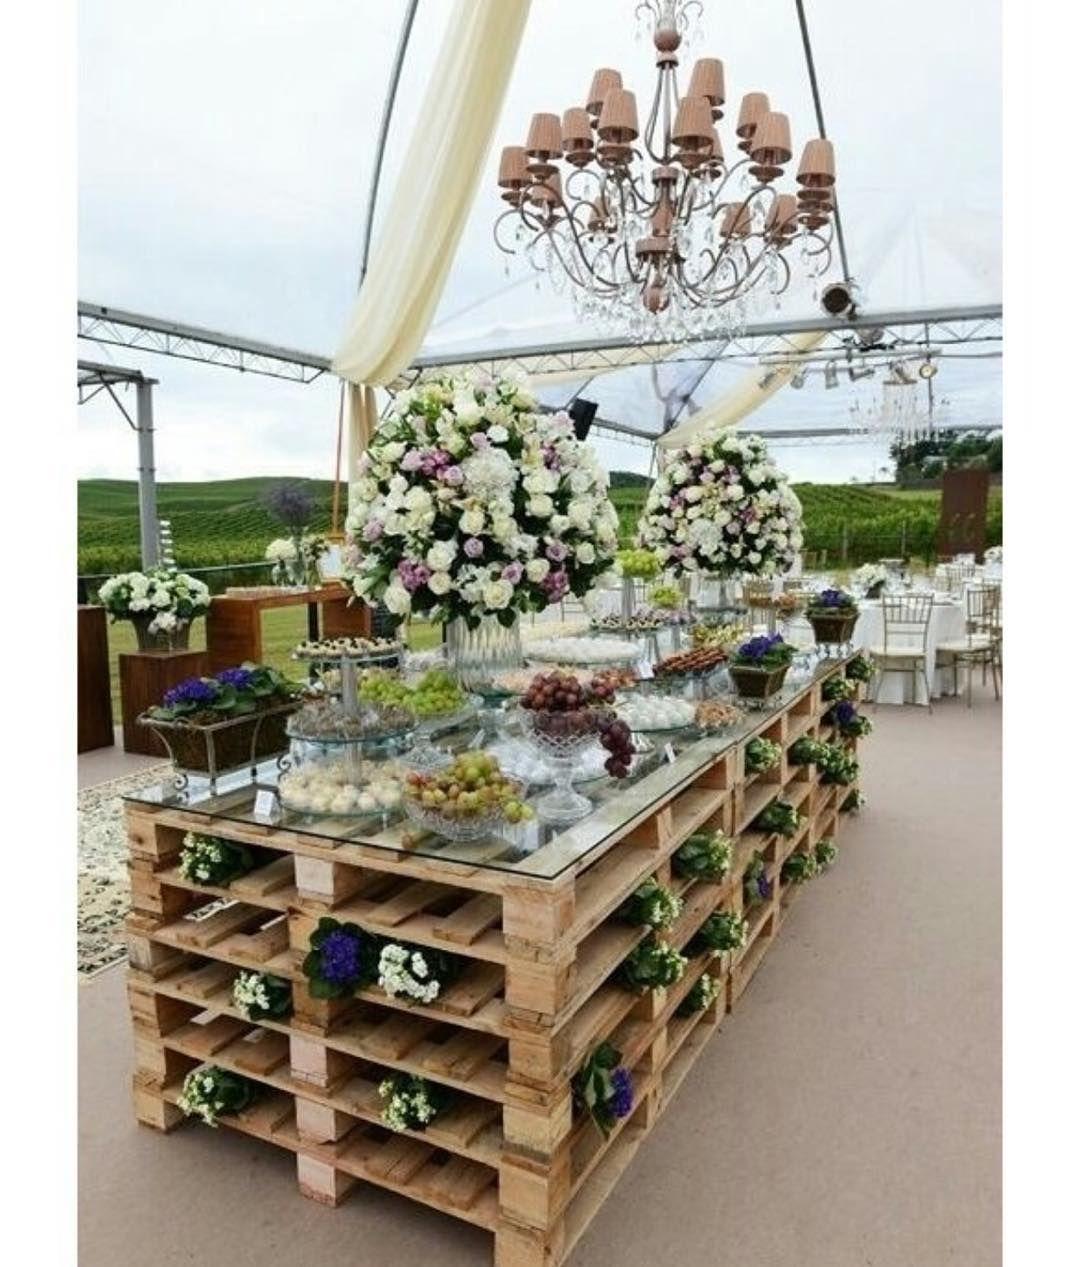 Pallet wedding decor ideas  Pin by Kathy TirschwellNewby on Decor ideas  Pinterest  Wedding